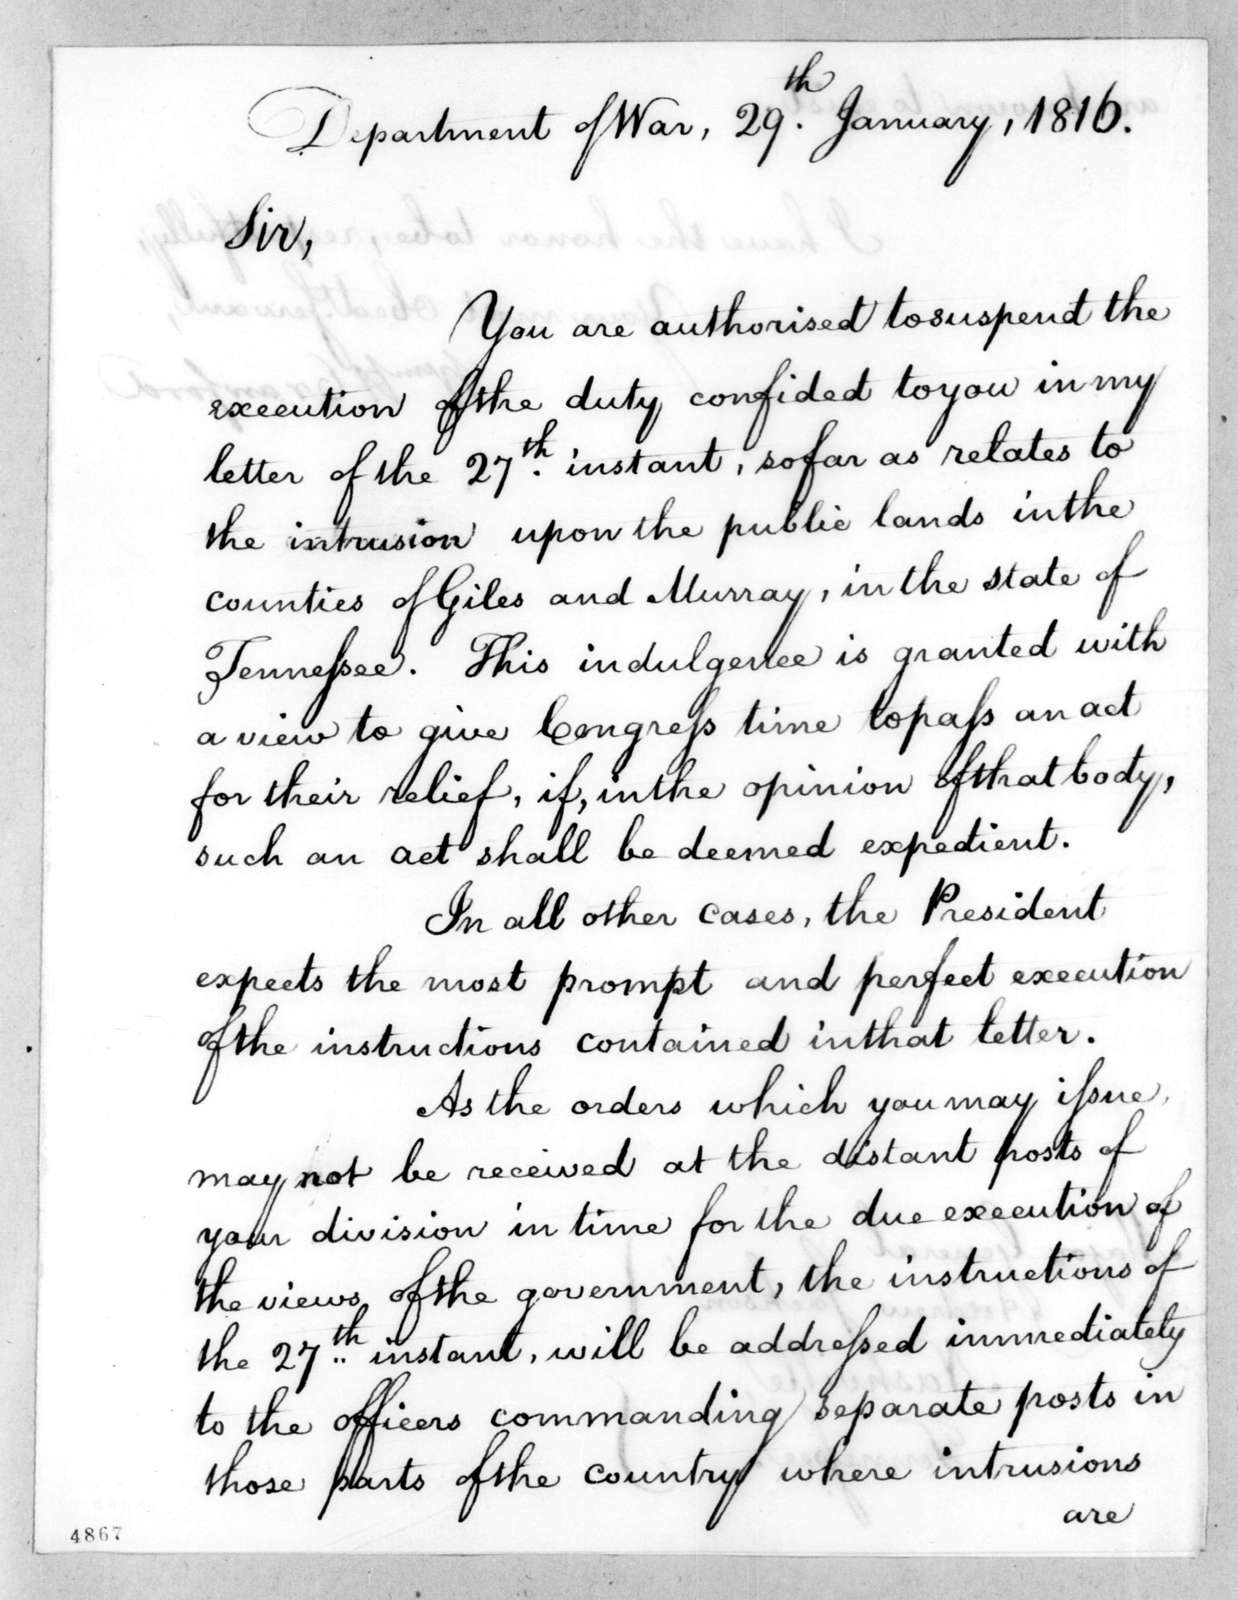 William Harris Crawford to Andrew Jackson, January 29, 1816